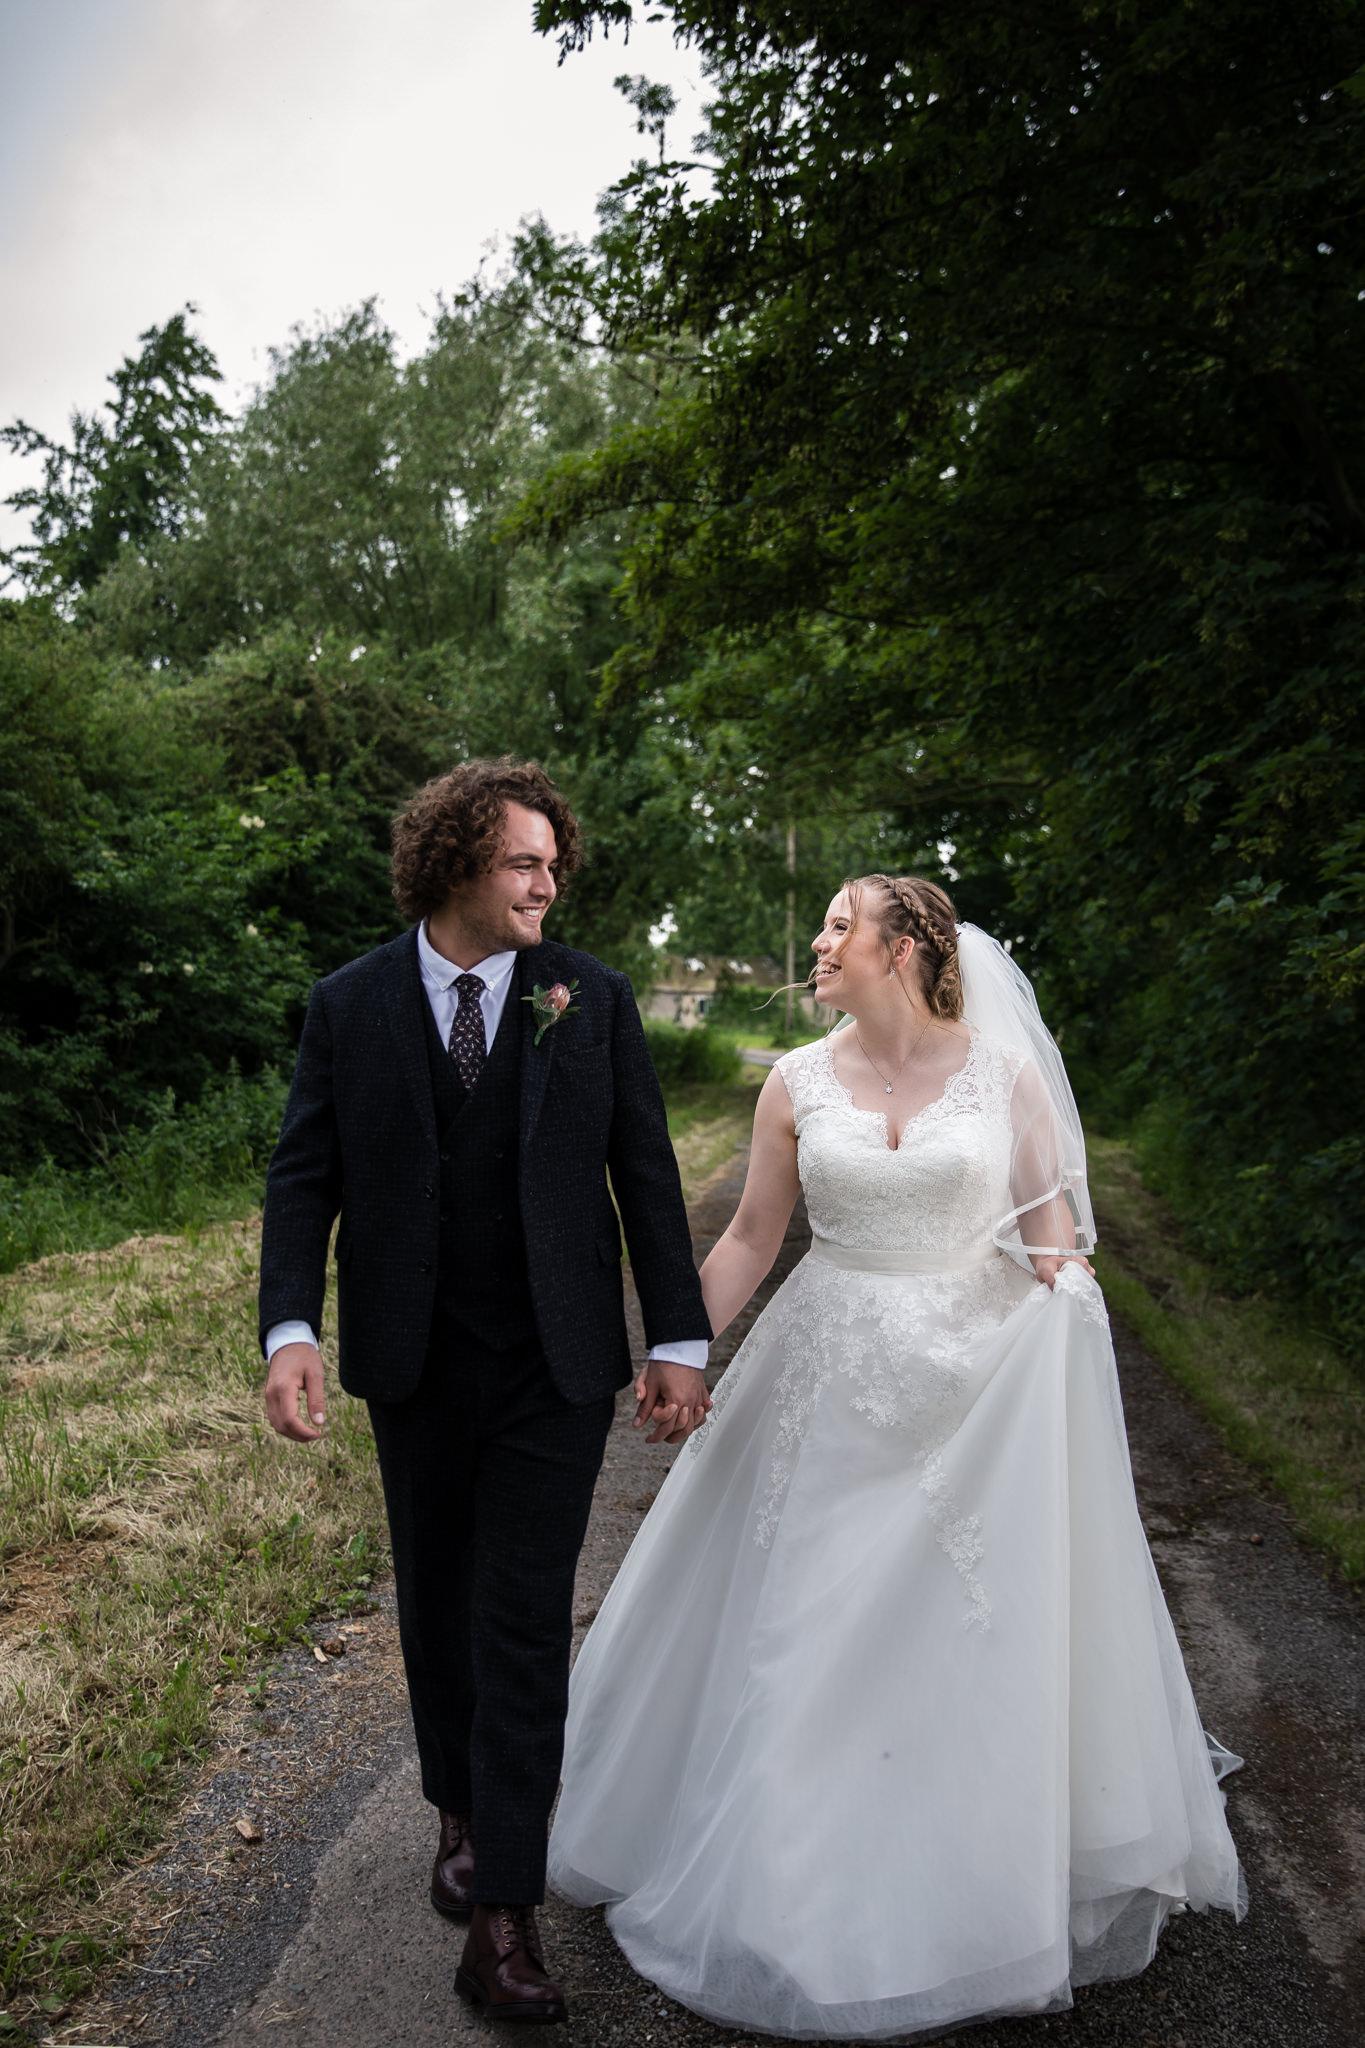 nottingham wedding44